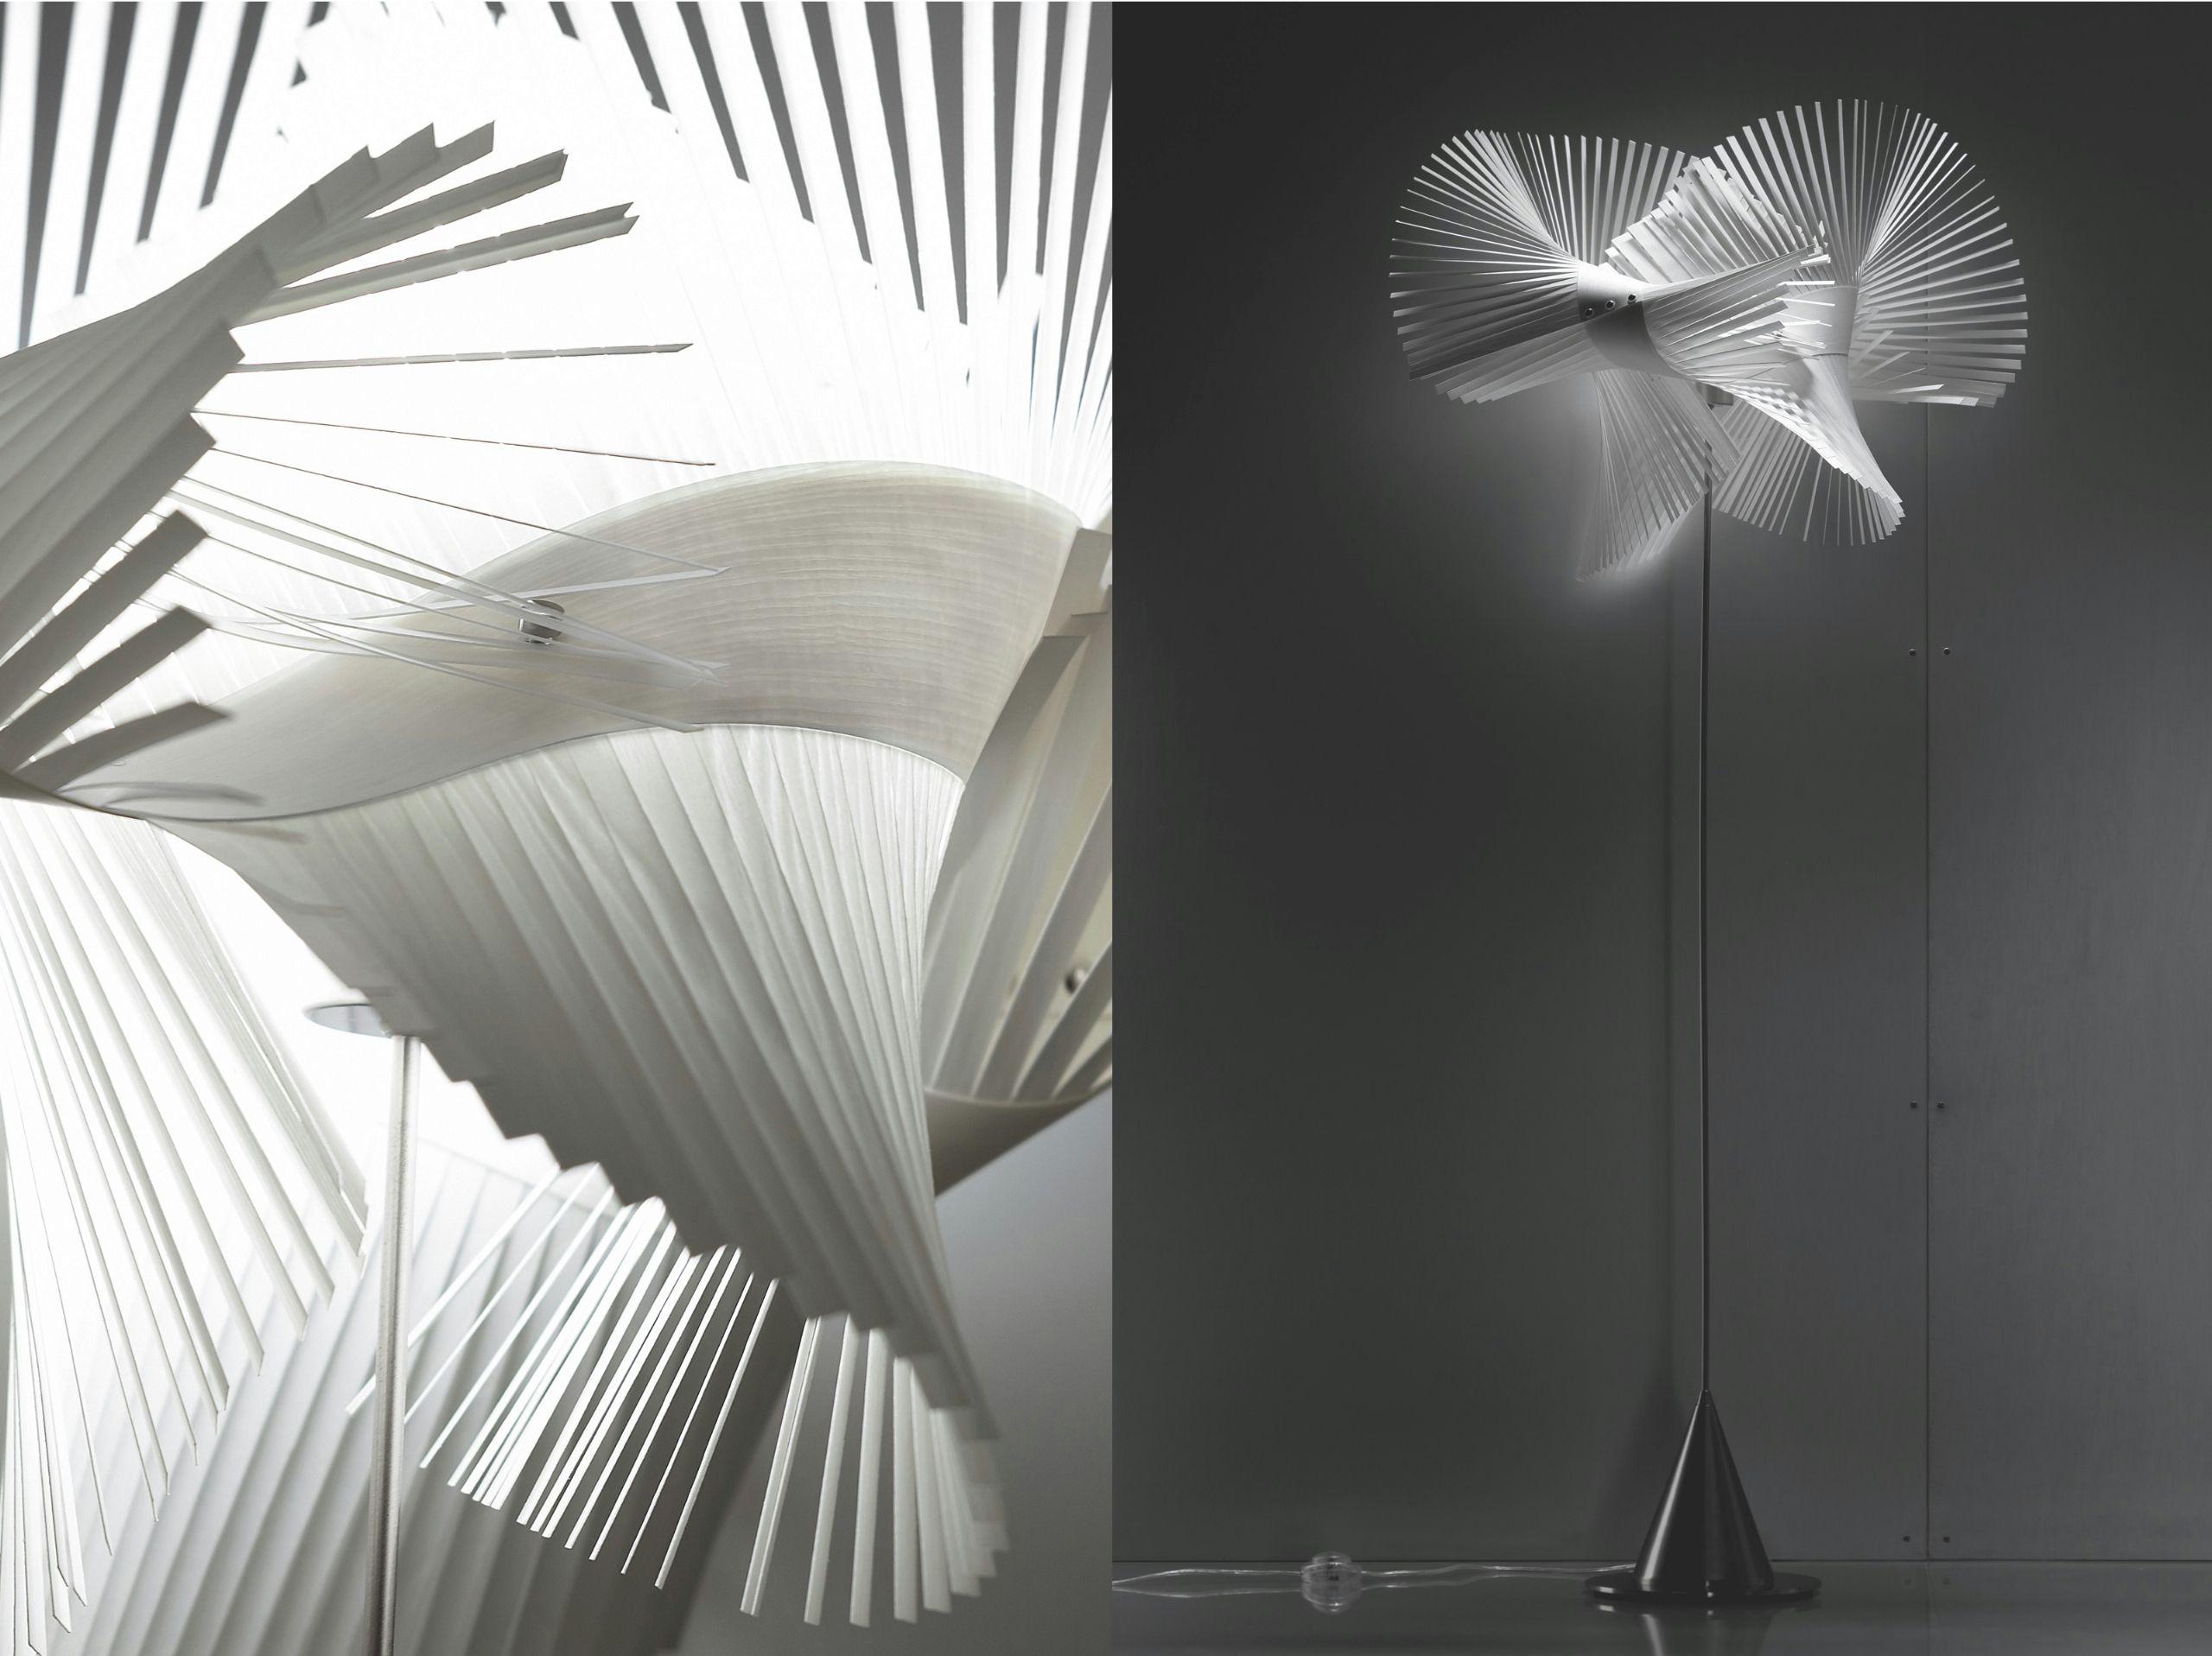 Handmade floor lamp MINI MIKADO P Mini Mikado Collection by LZF   design Miguel Herranz